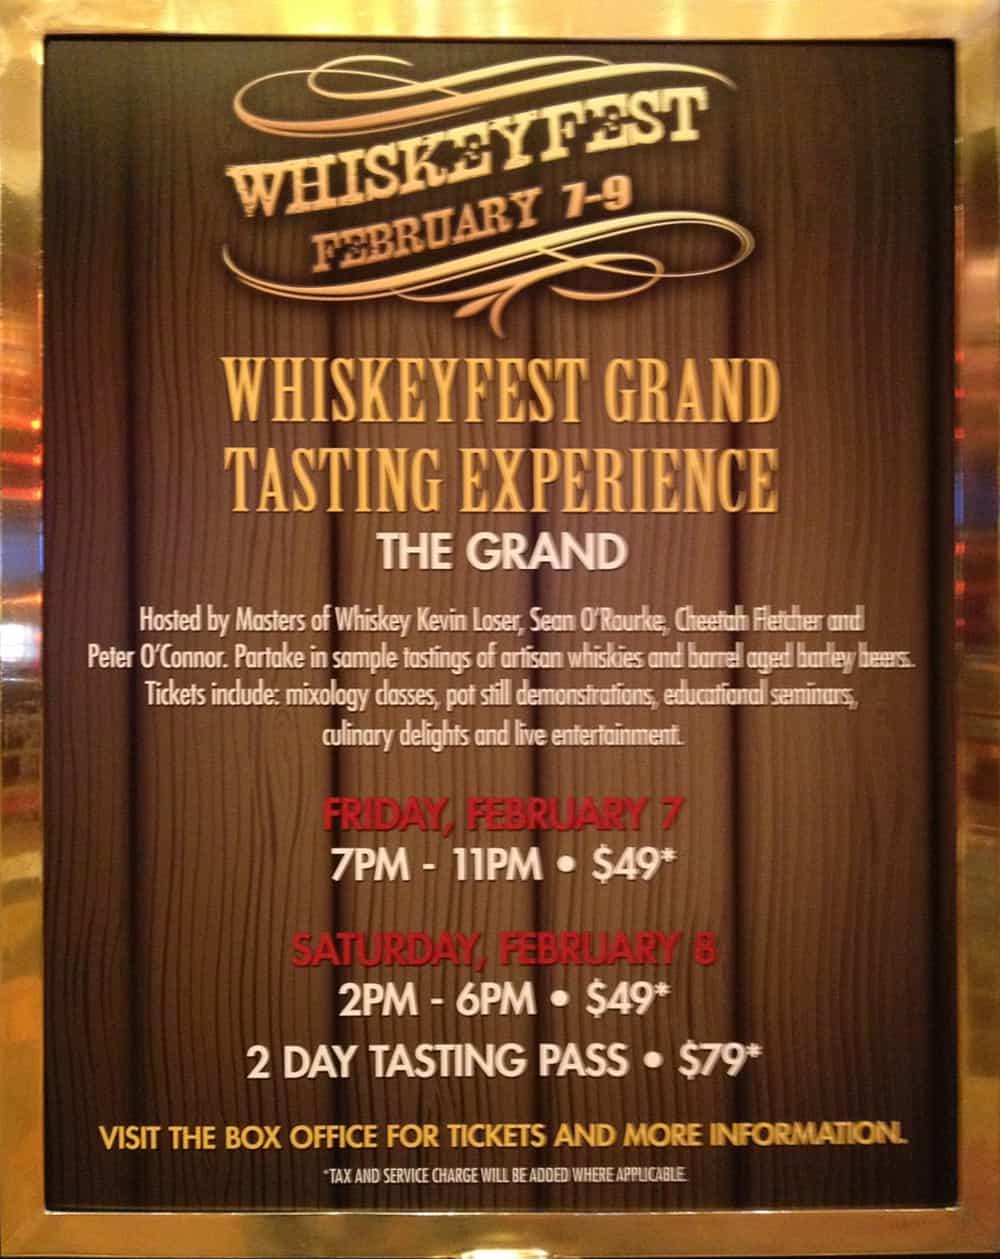 WhiskeyFest at the Golden Nugget Grand Ballroon, Las Vegas, 2014